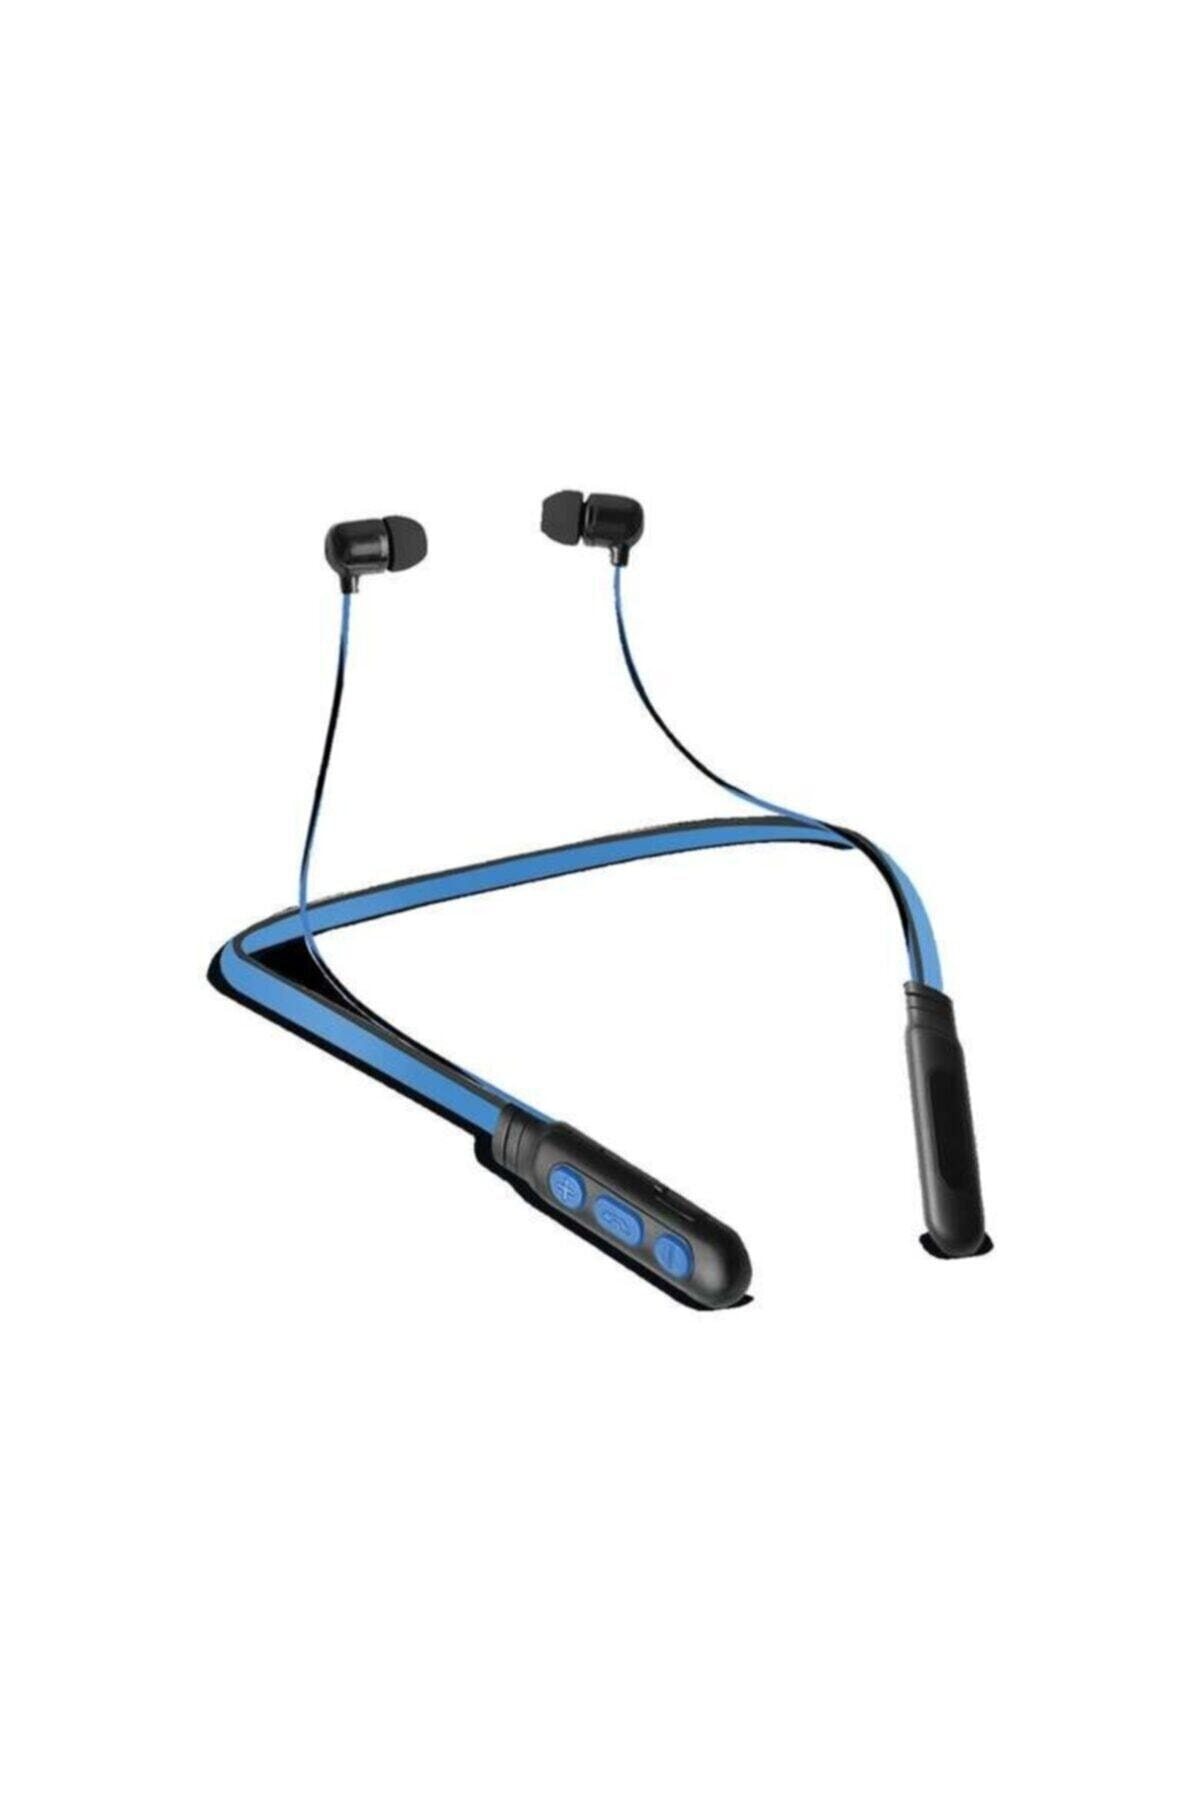 Piranha Kablosuz Mavi İos Android Uyumlu Spor Bluetooth Kulaklık 2281  Fiyatı, Yorumları - Trendyol